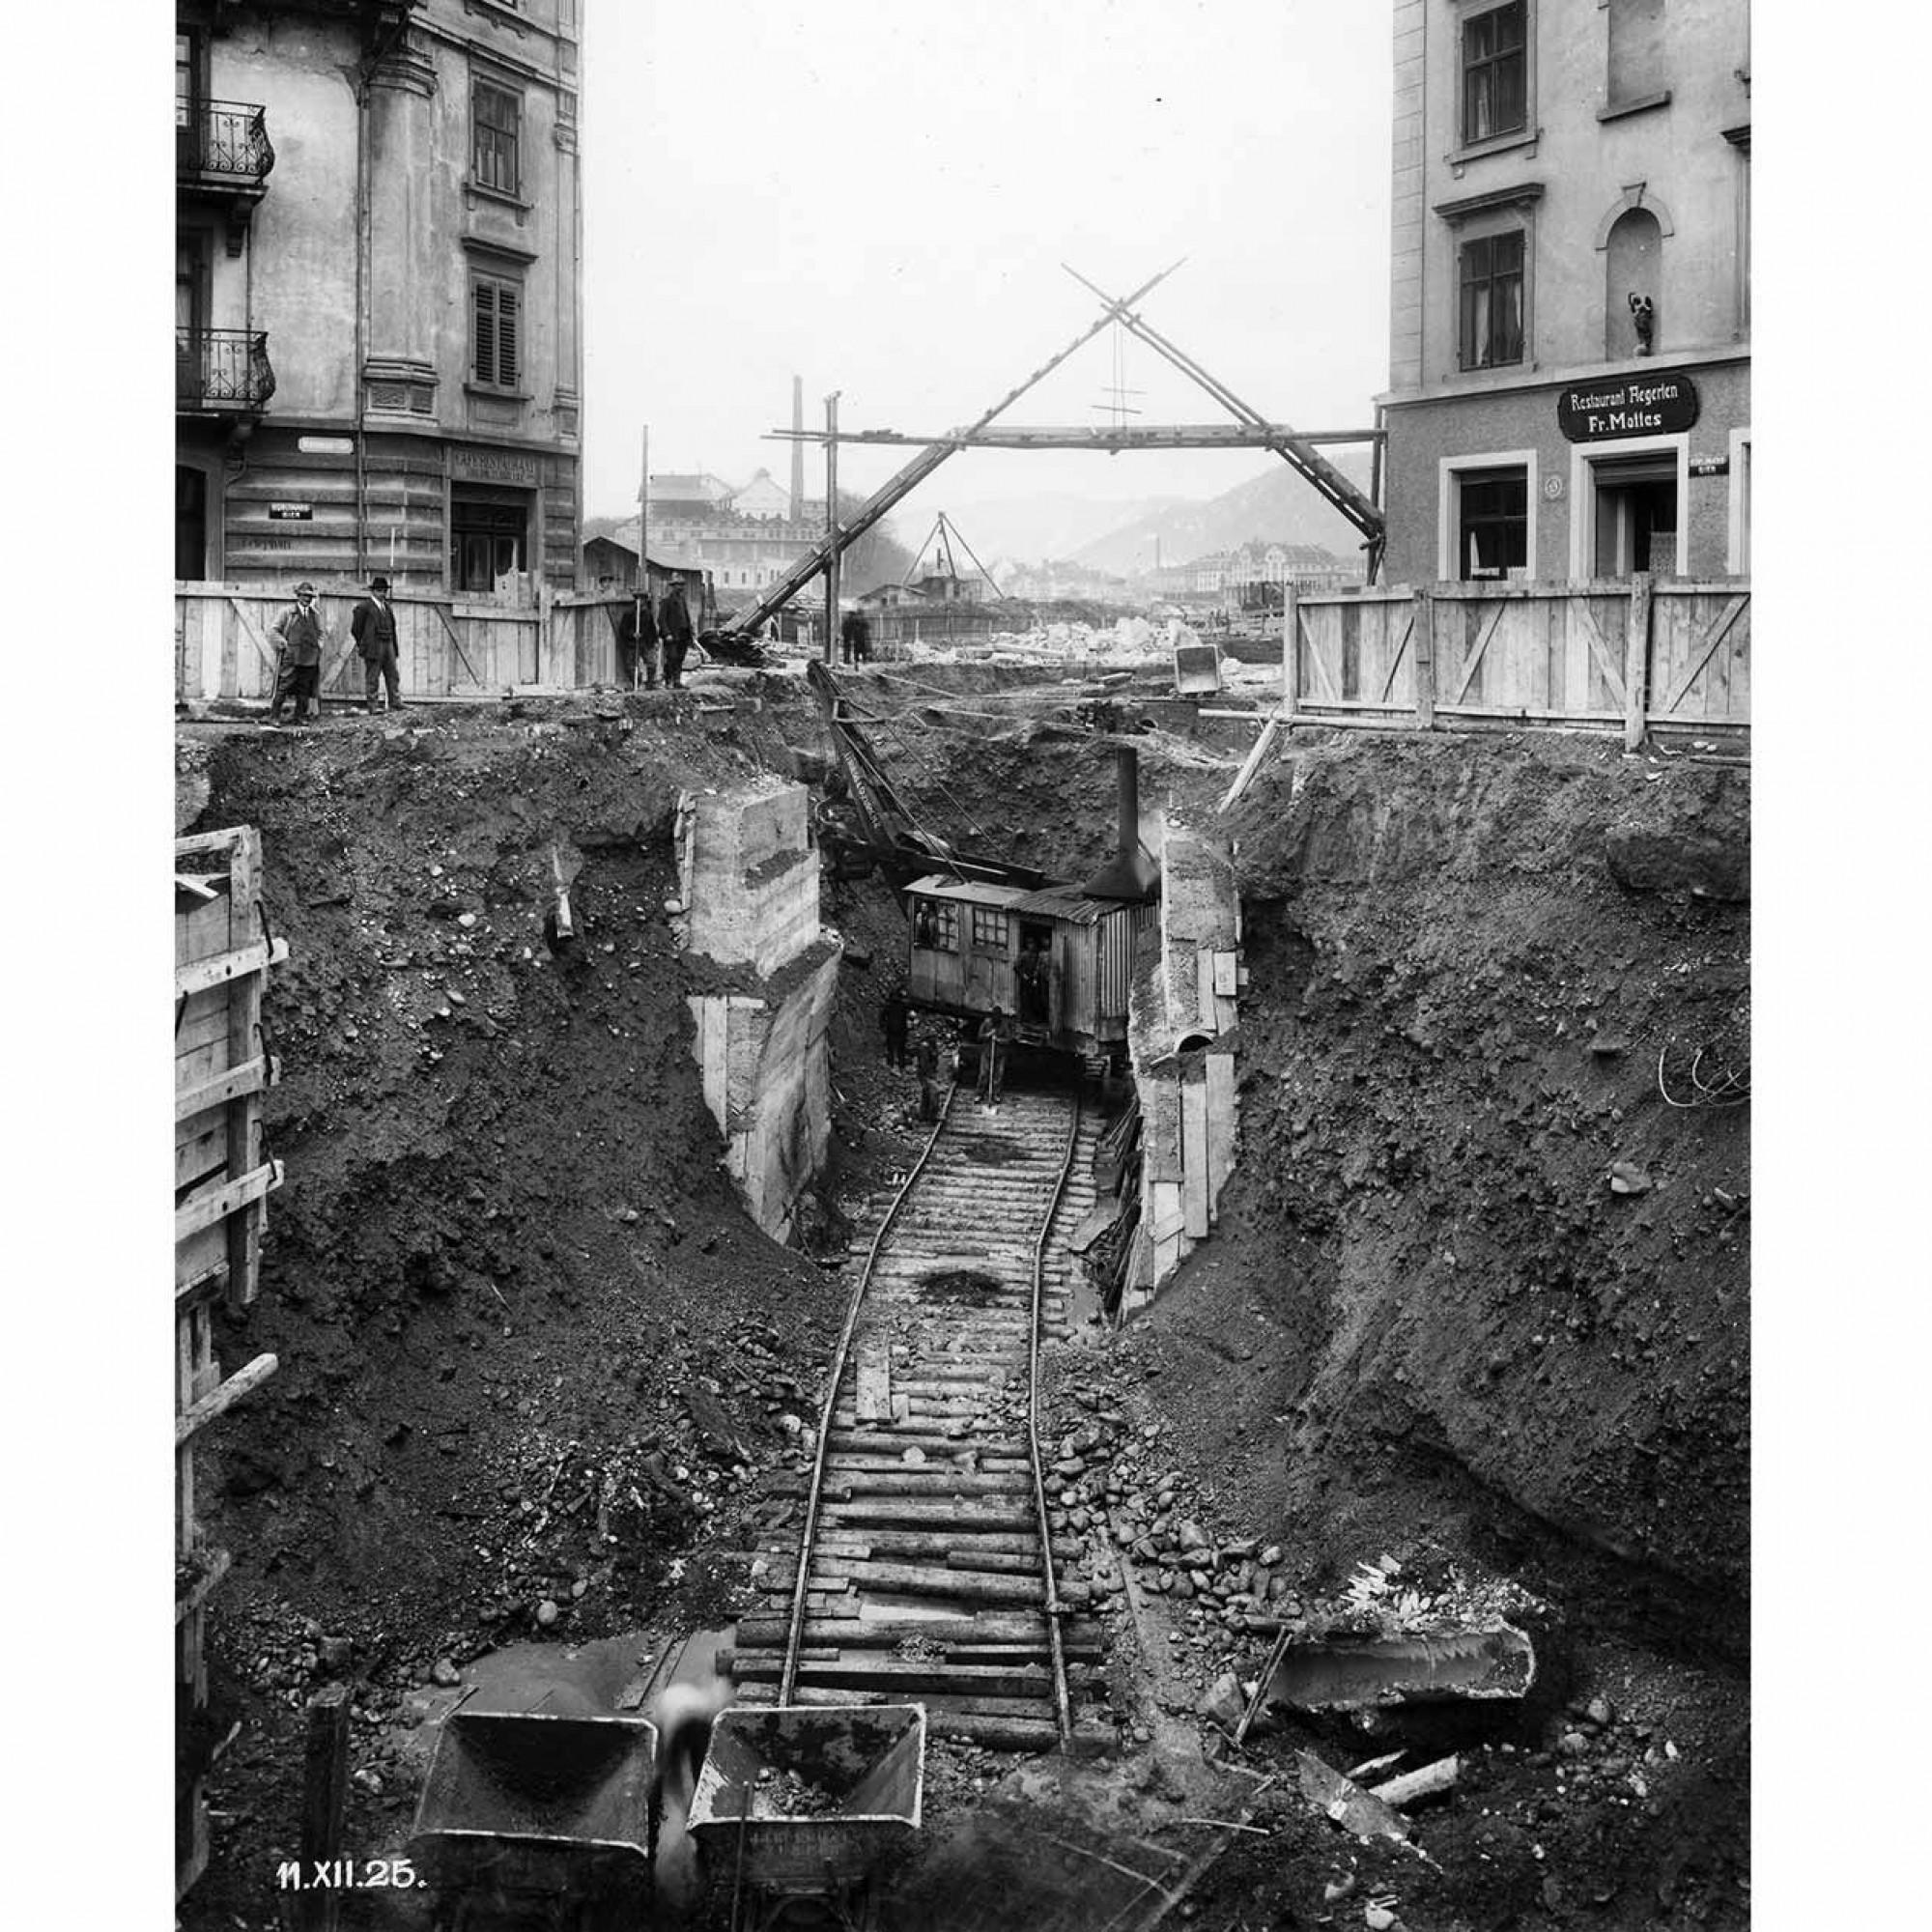 Baustelle 1925